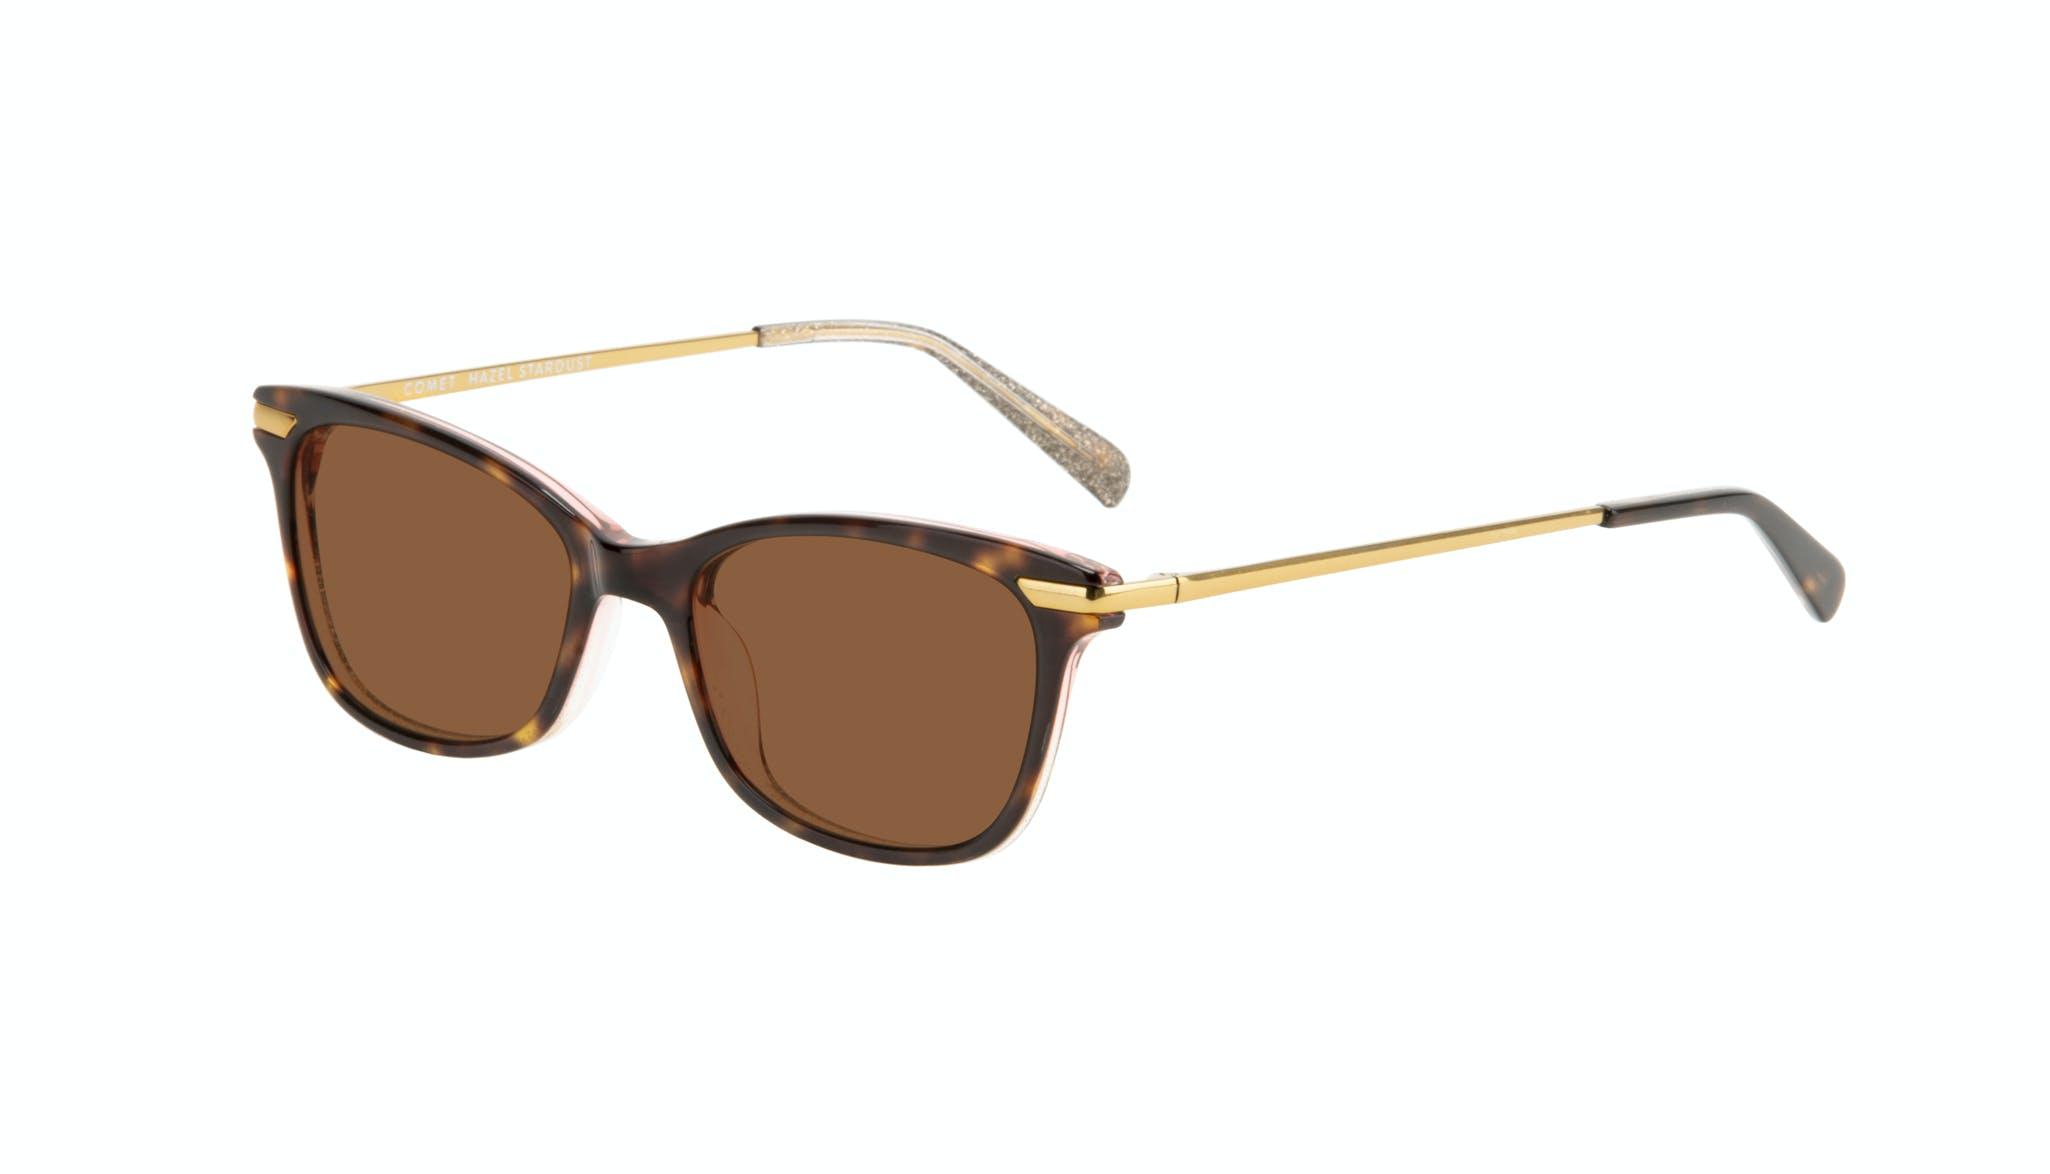 Affordable Fashion Glasses Rectangle Sunglasses Women Comet II Hazel Stardust Tilt